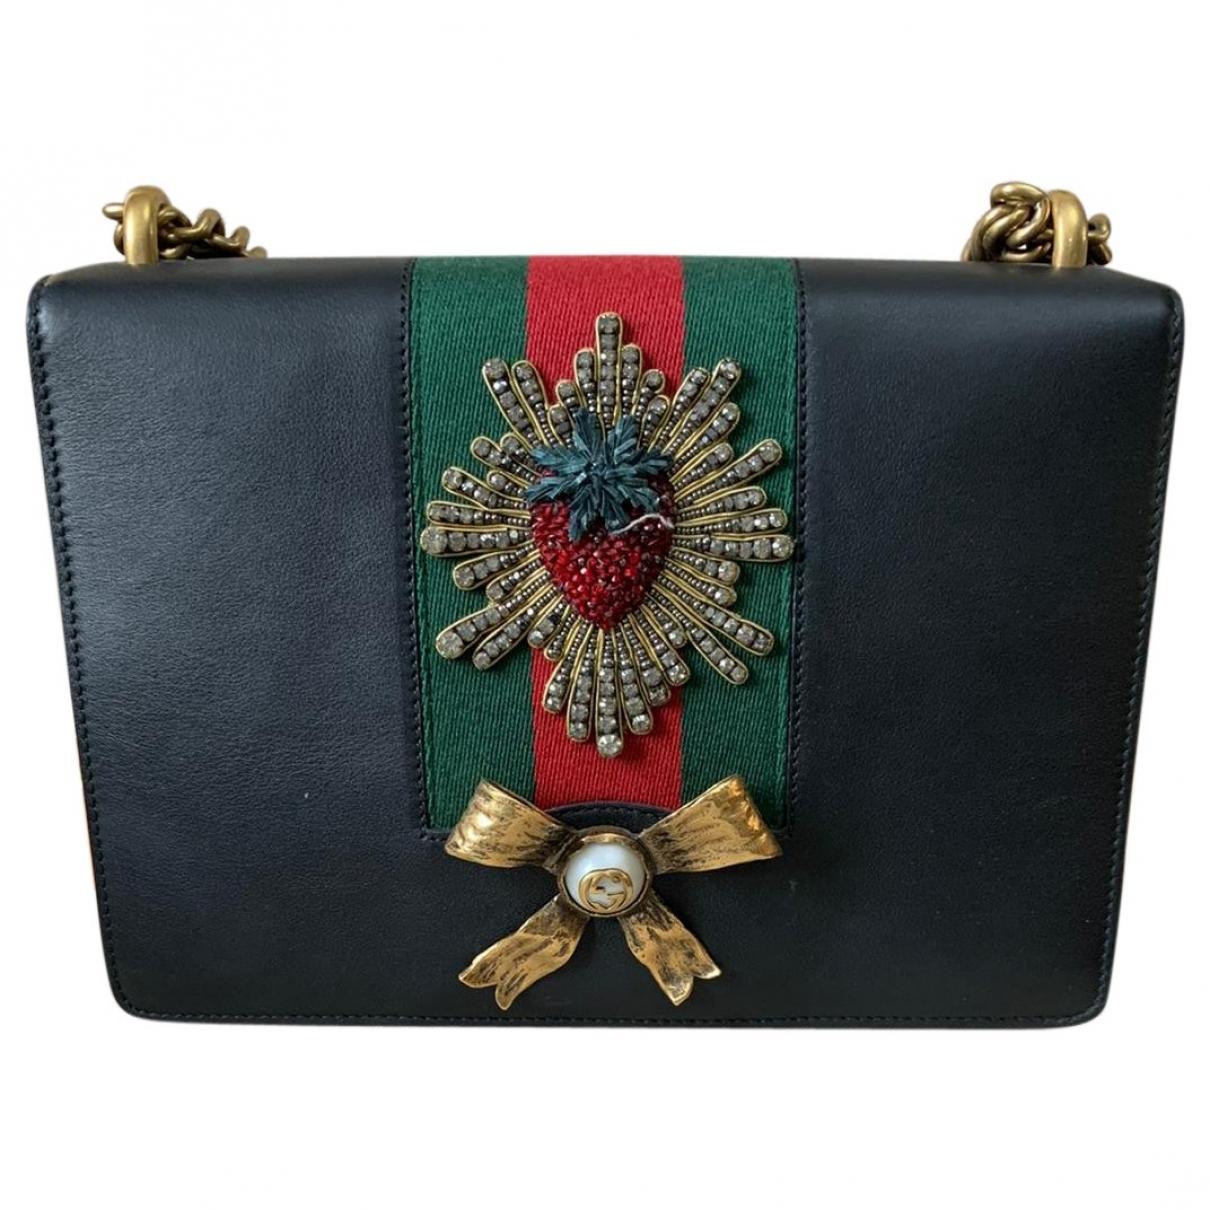 Gucci \N Multicolour Leather handbag for Women \N